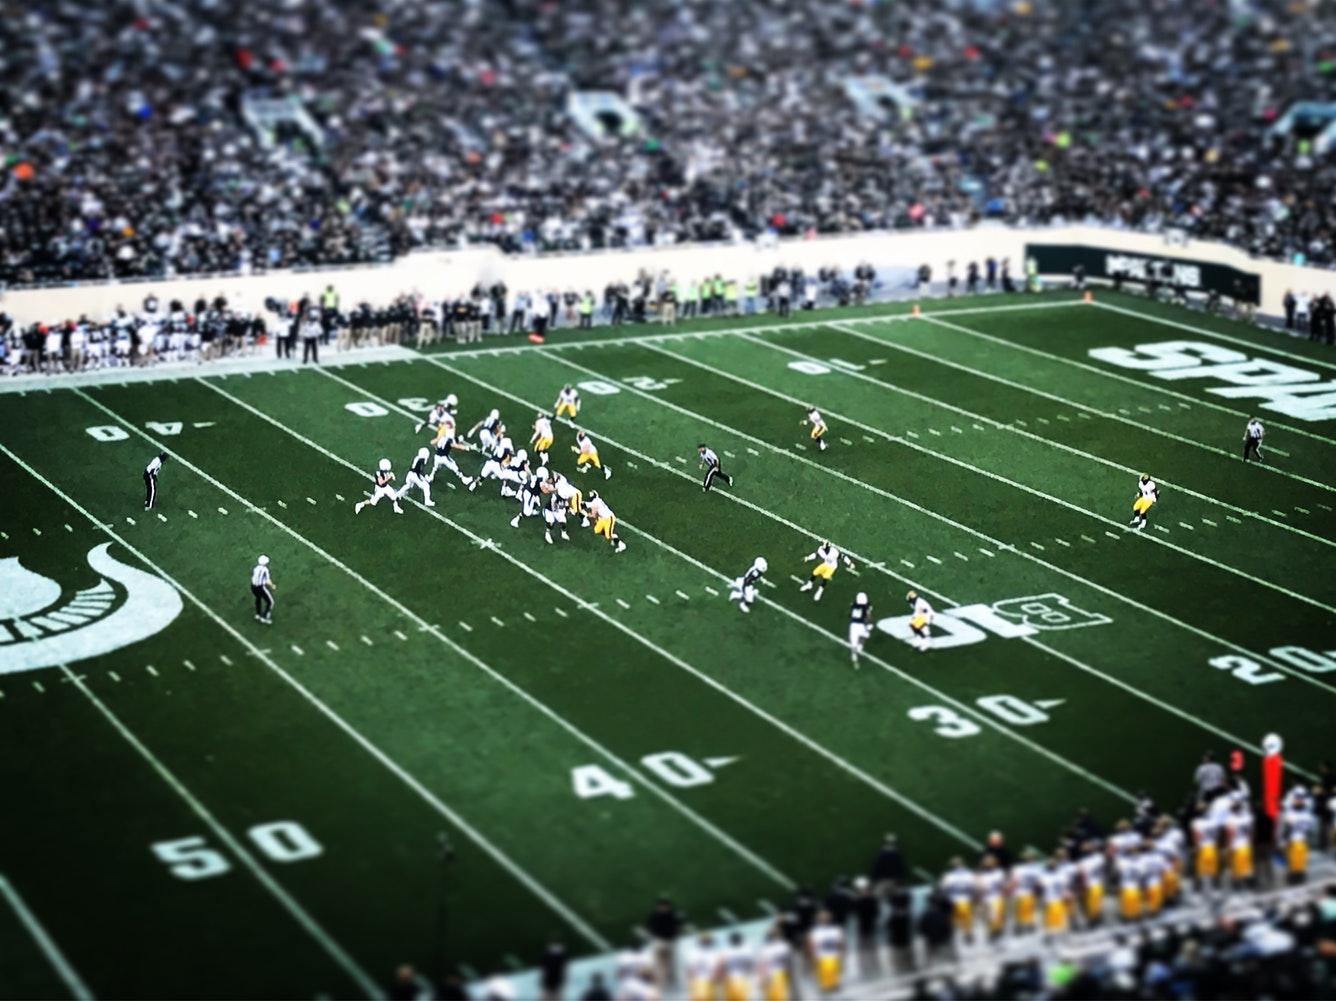 Football Field, Football Stadium, Football Fans, Football Season